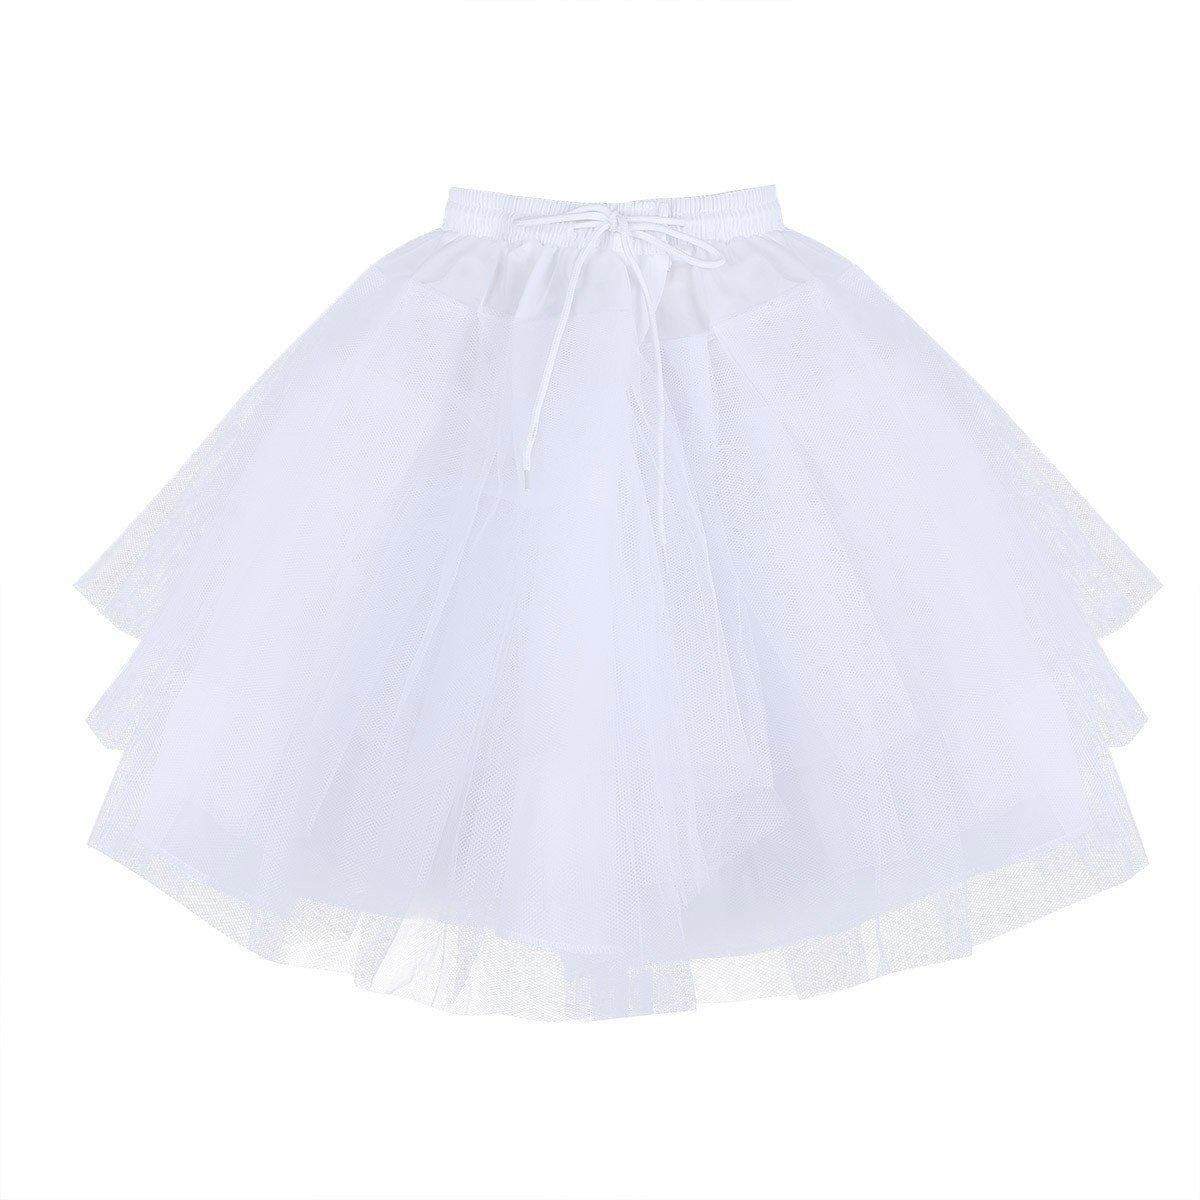 TiaoBug Kids Flower Girls 3 Layers Net Pageant Evening Wedding Dress Underskirt Crinoline Slip Bridesmaid Skirt Petticoat T10039732-10037995-US